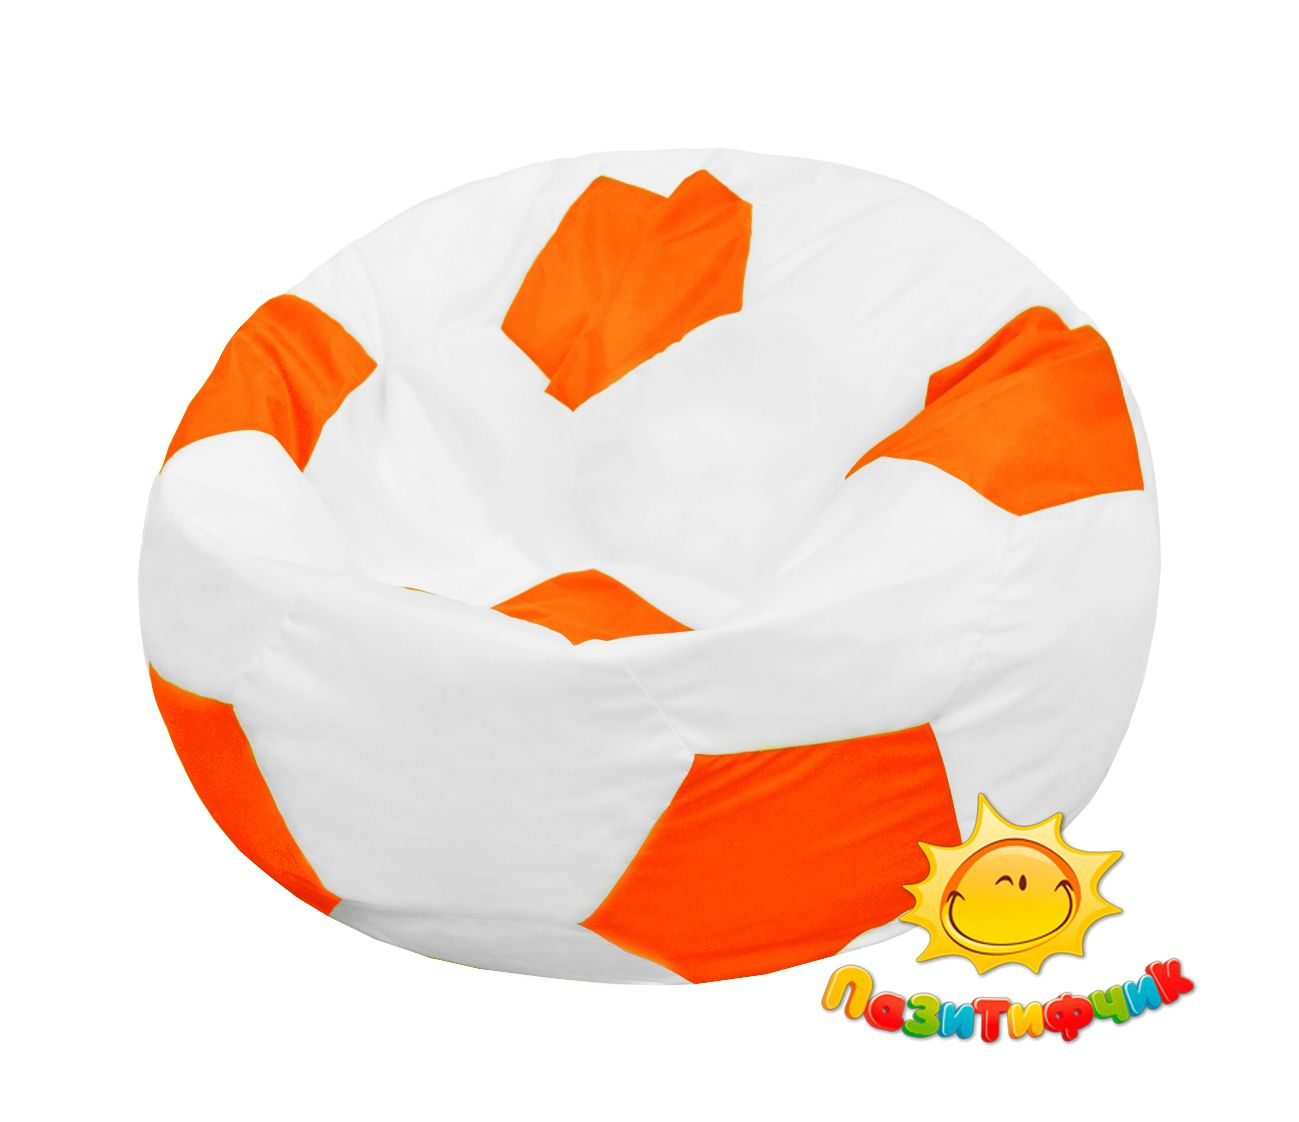 Кресло-мяч Pazitif Мяч Пазитифчик, размер L, оксфорд, бело-оранжевый фото